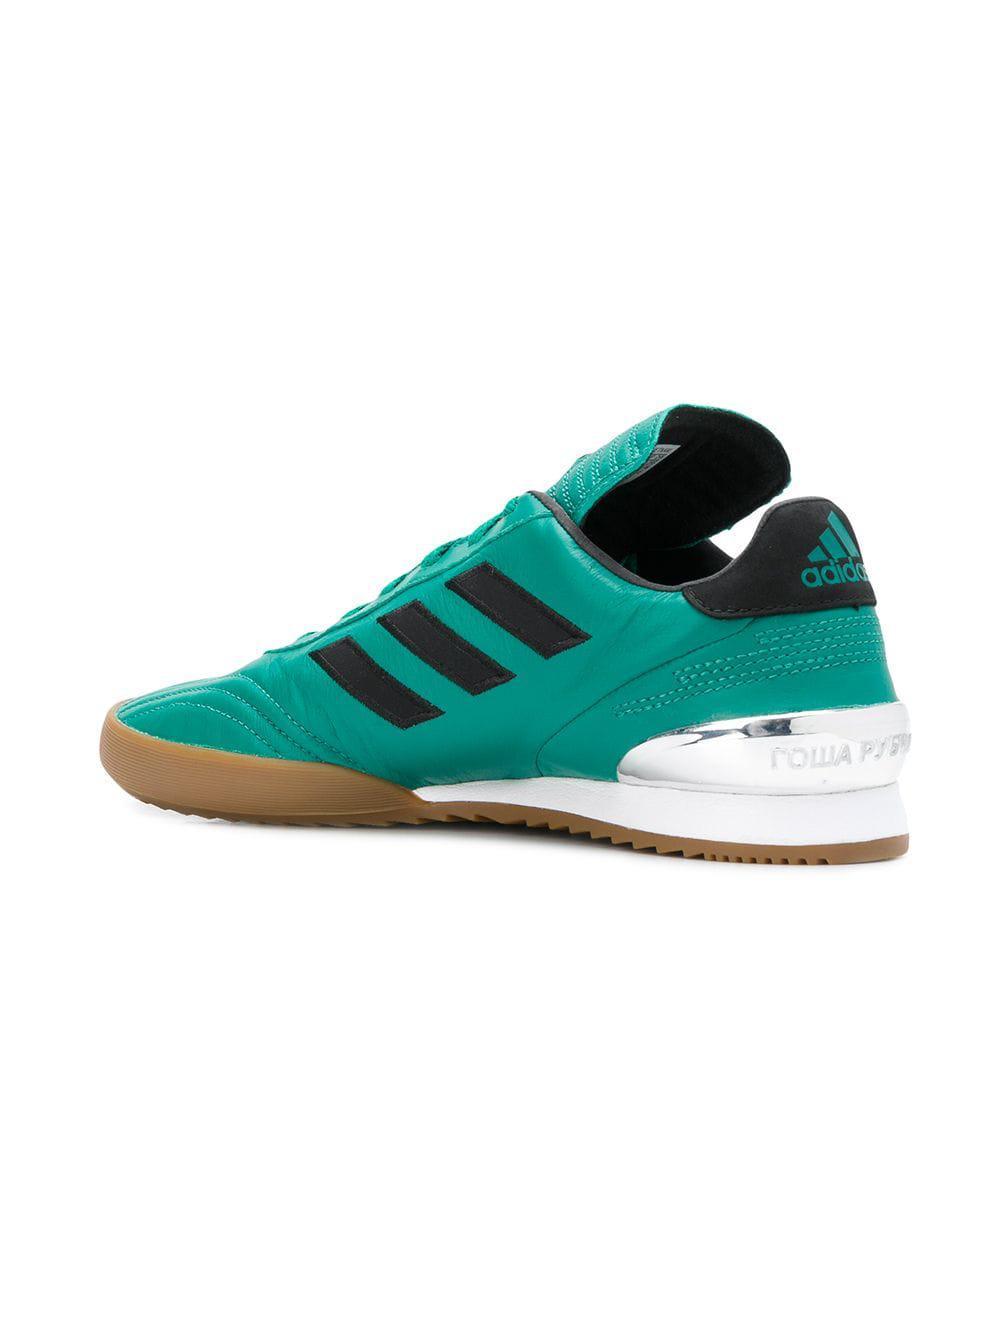 Green Sneaker In Wc Adidas Men Gosha For Rubchinskiy Lyst X Copa waZ711q